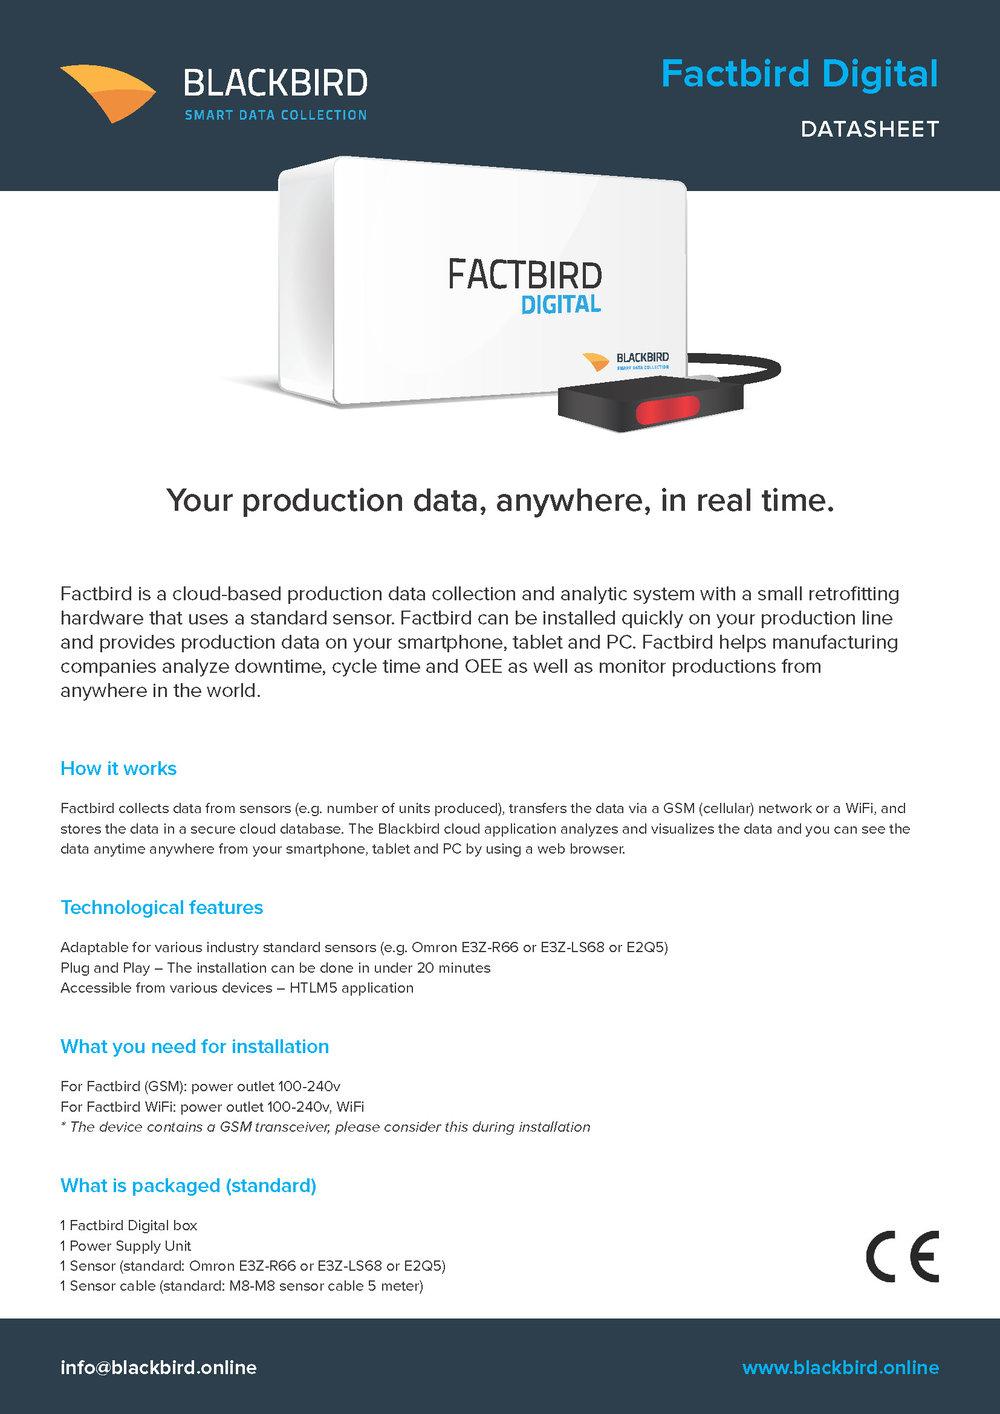 Factbird Digital Datasheet.jpg